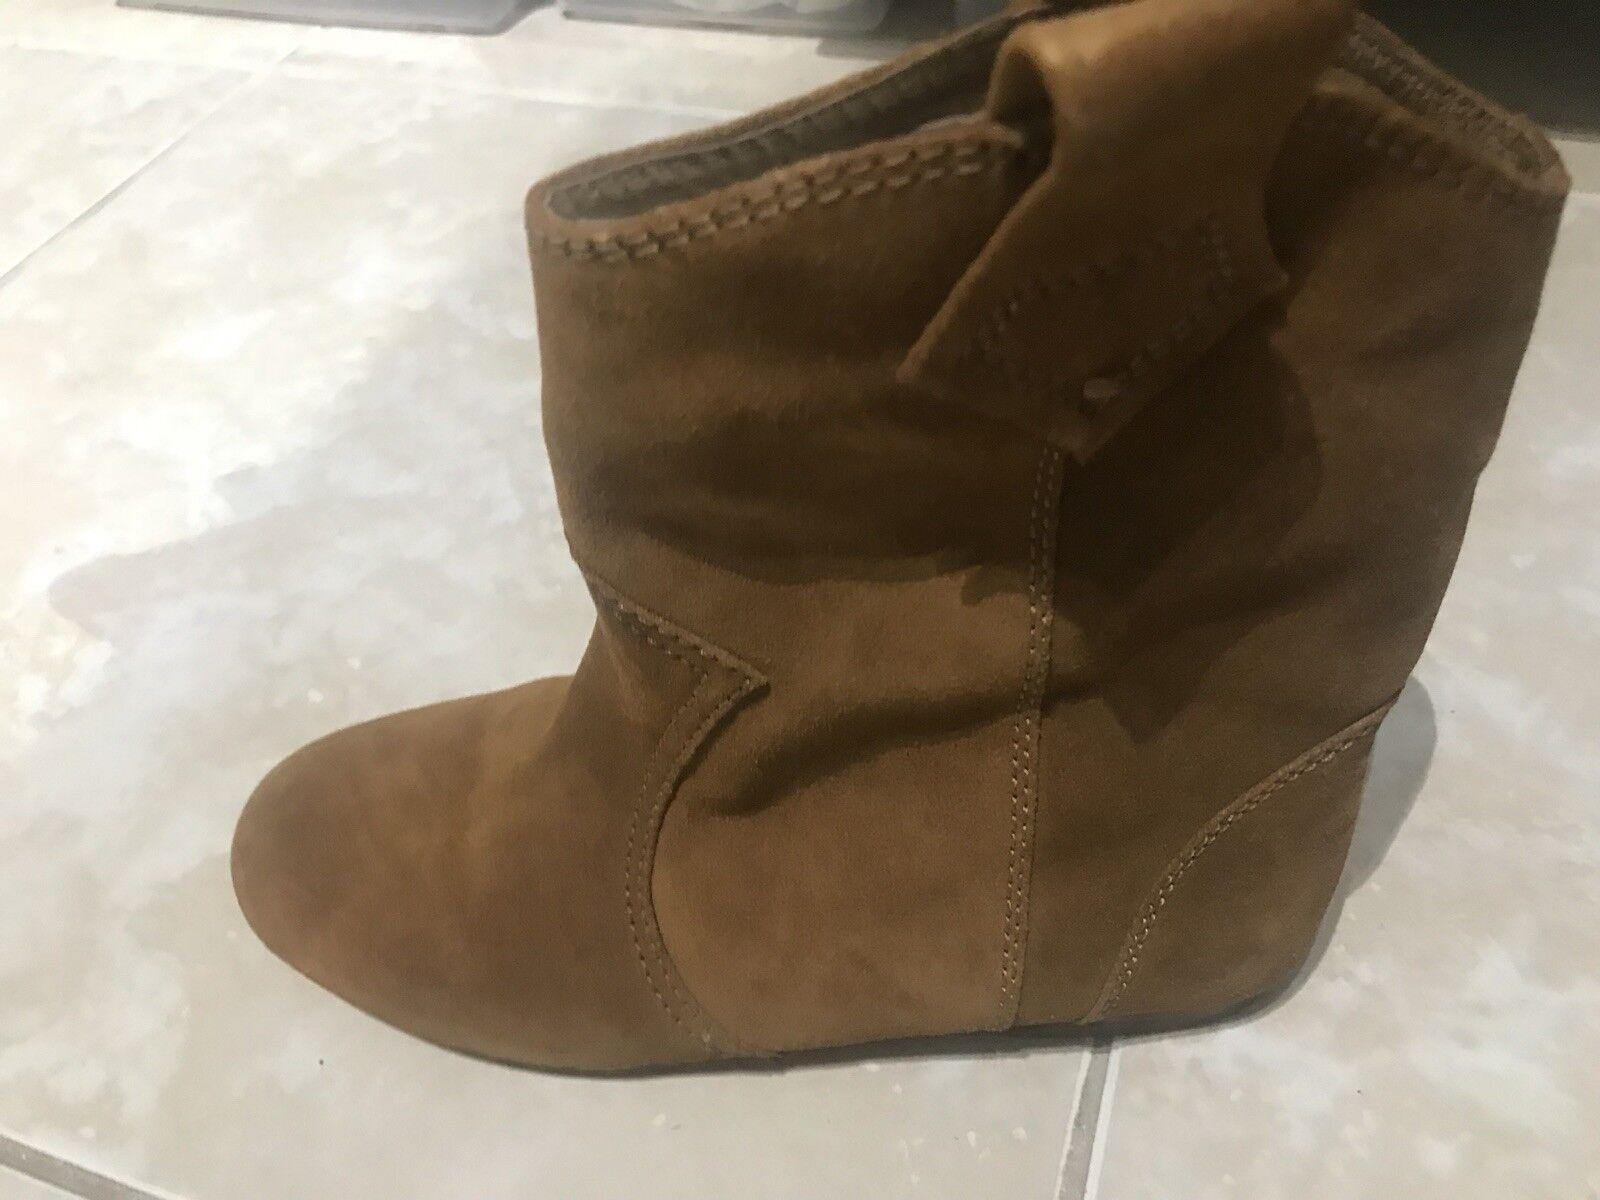 Aldo Boots Tan Size 36